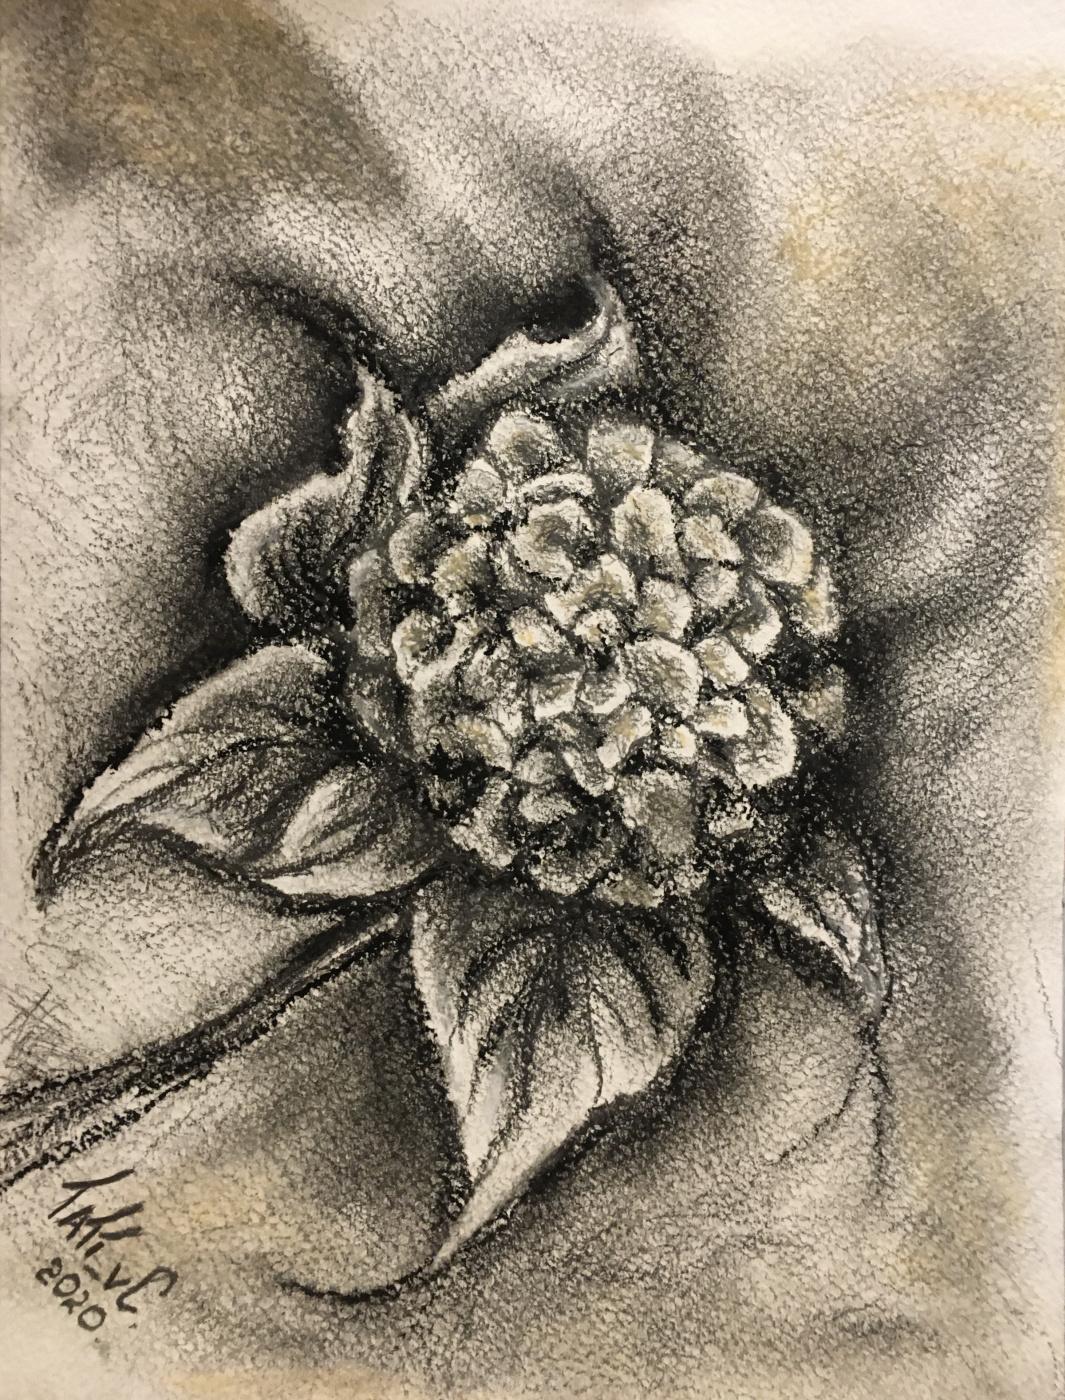 Tati_vC. Magic Herbarium - Hydrangea